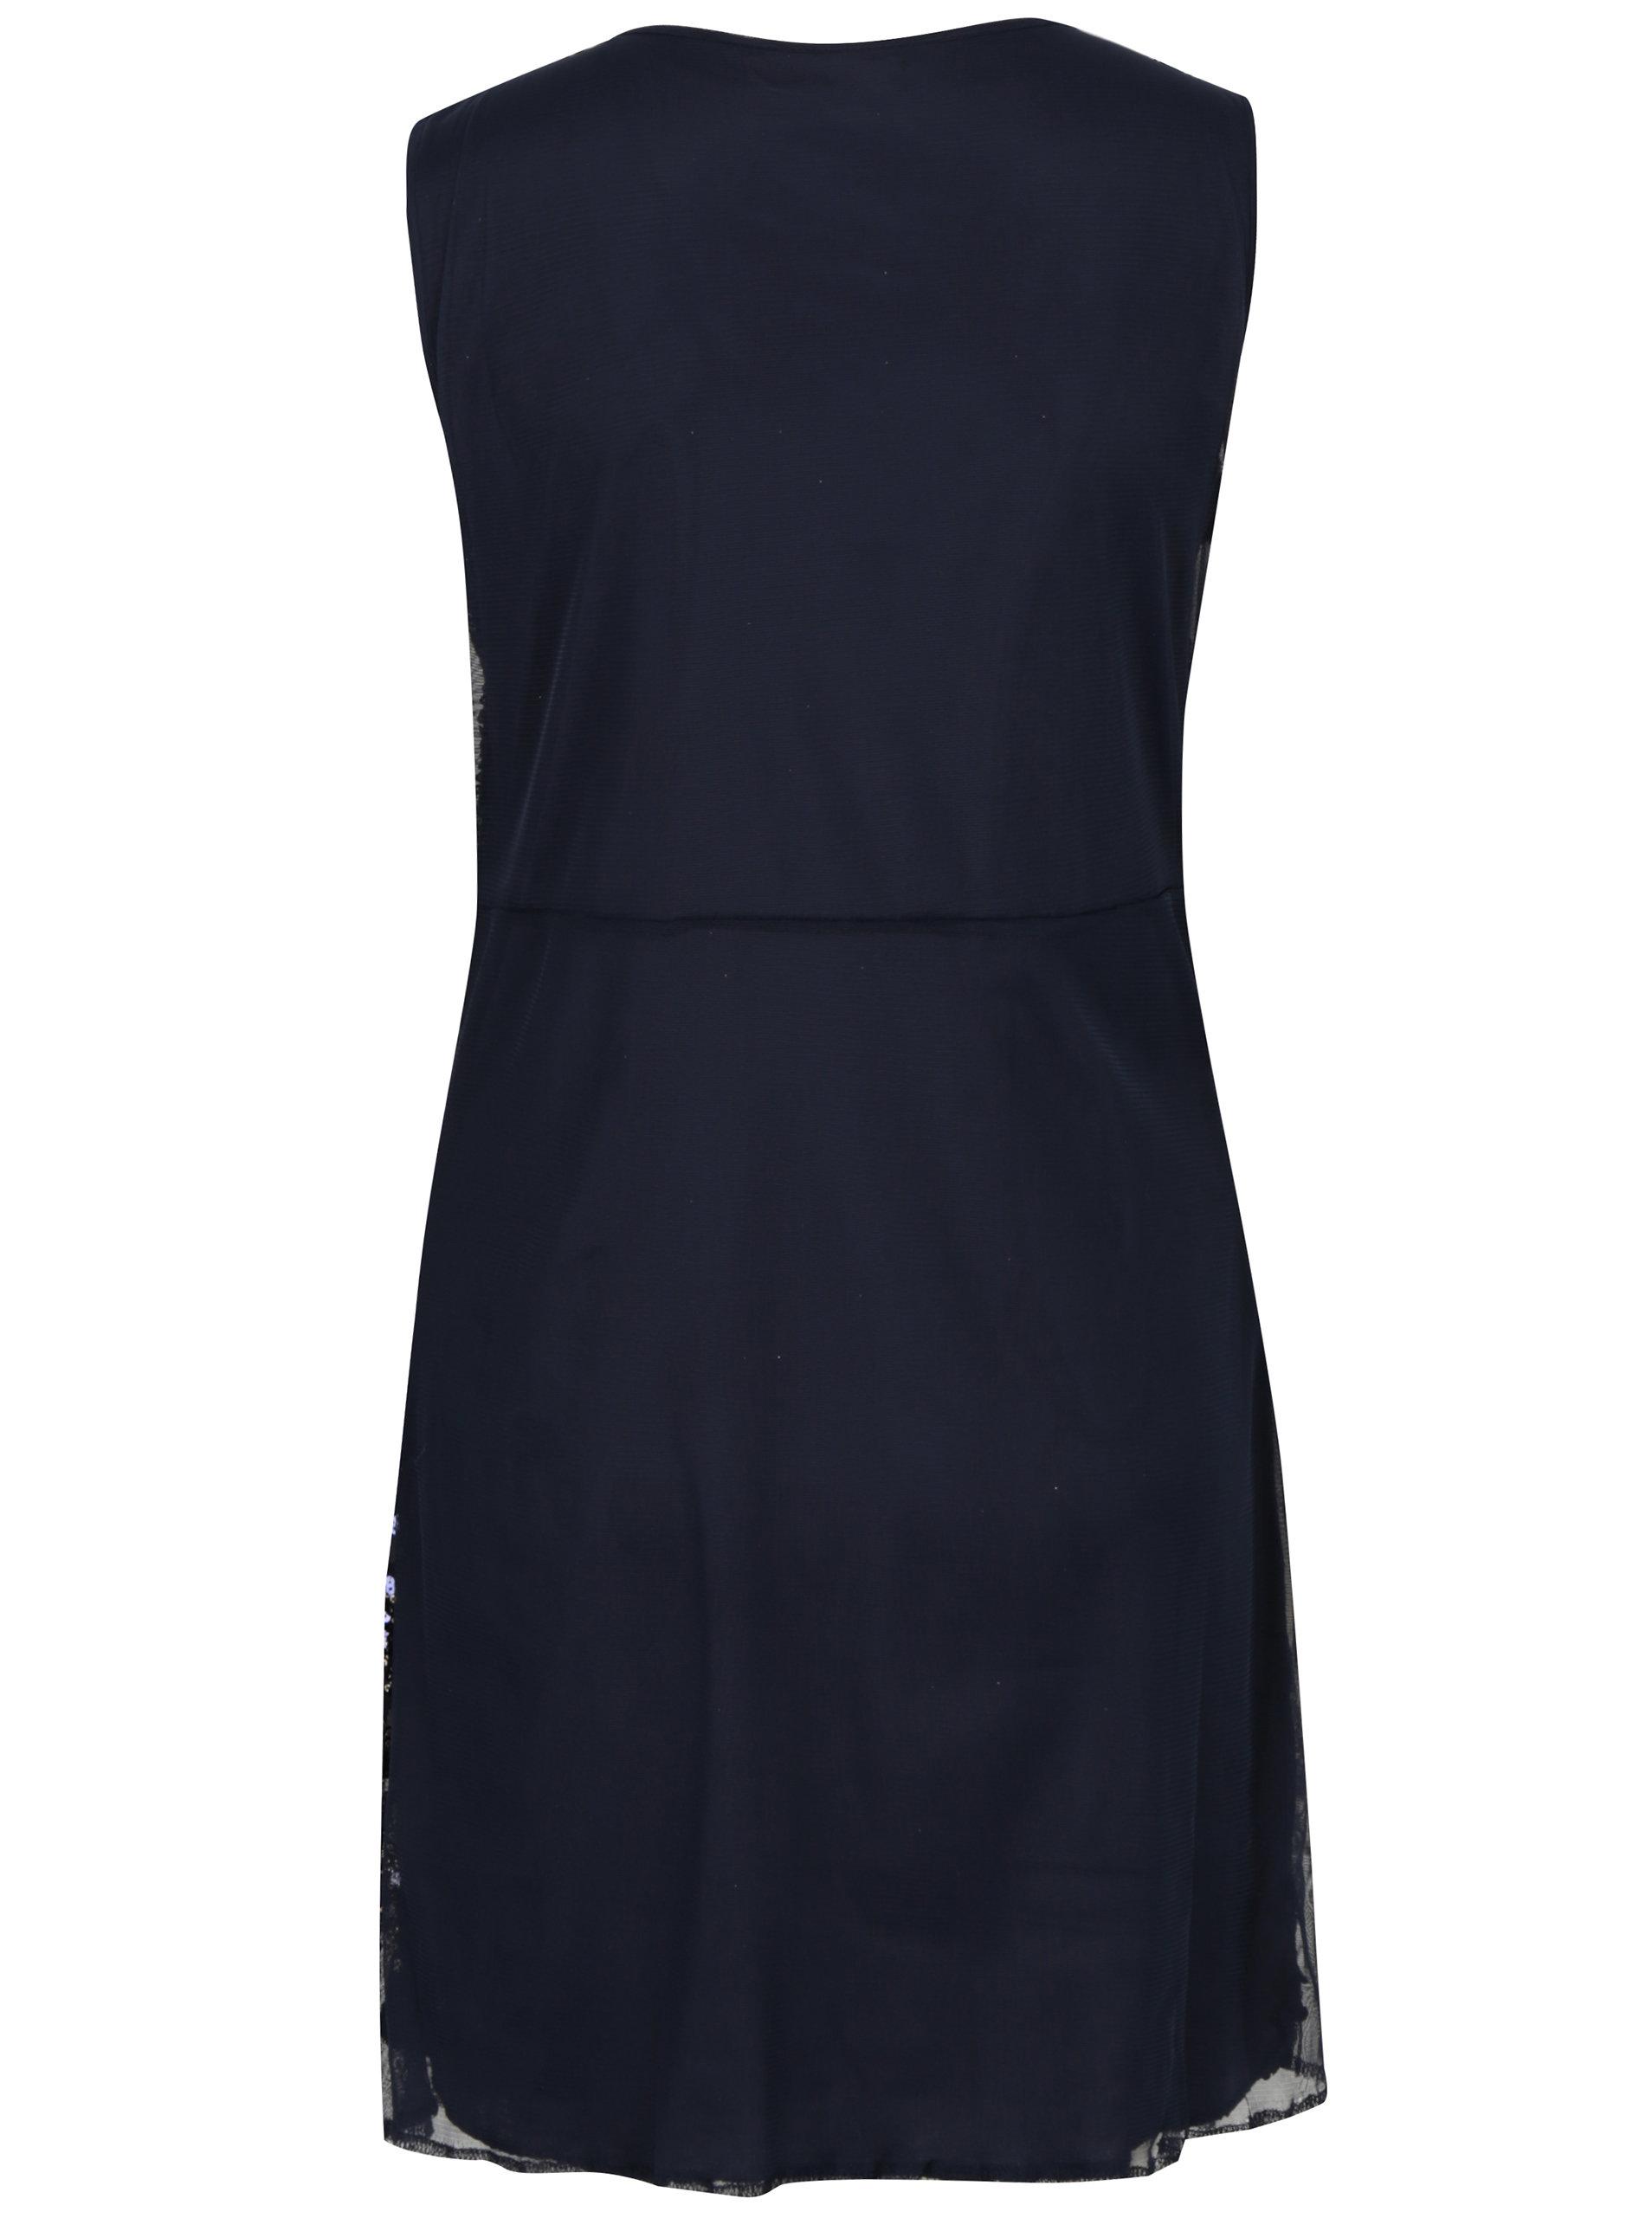 Tmavomodré šaty s flitrami Mela London ... fab528e9b49